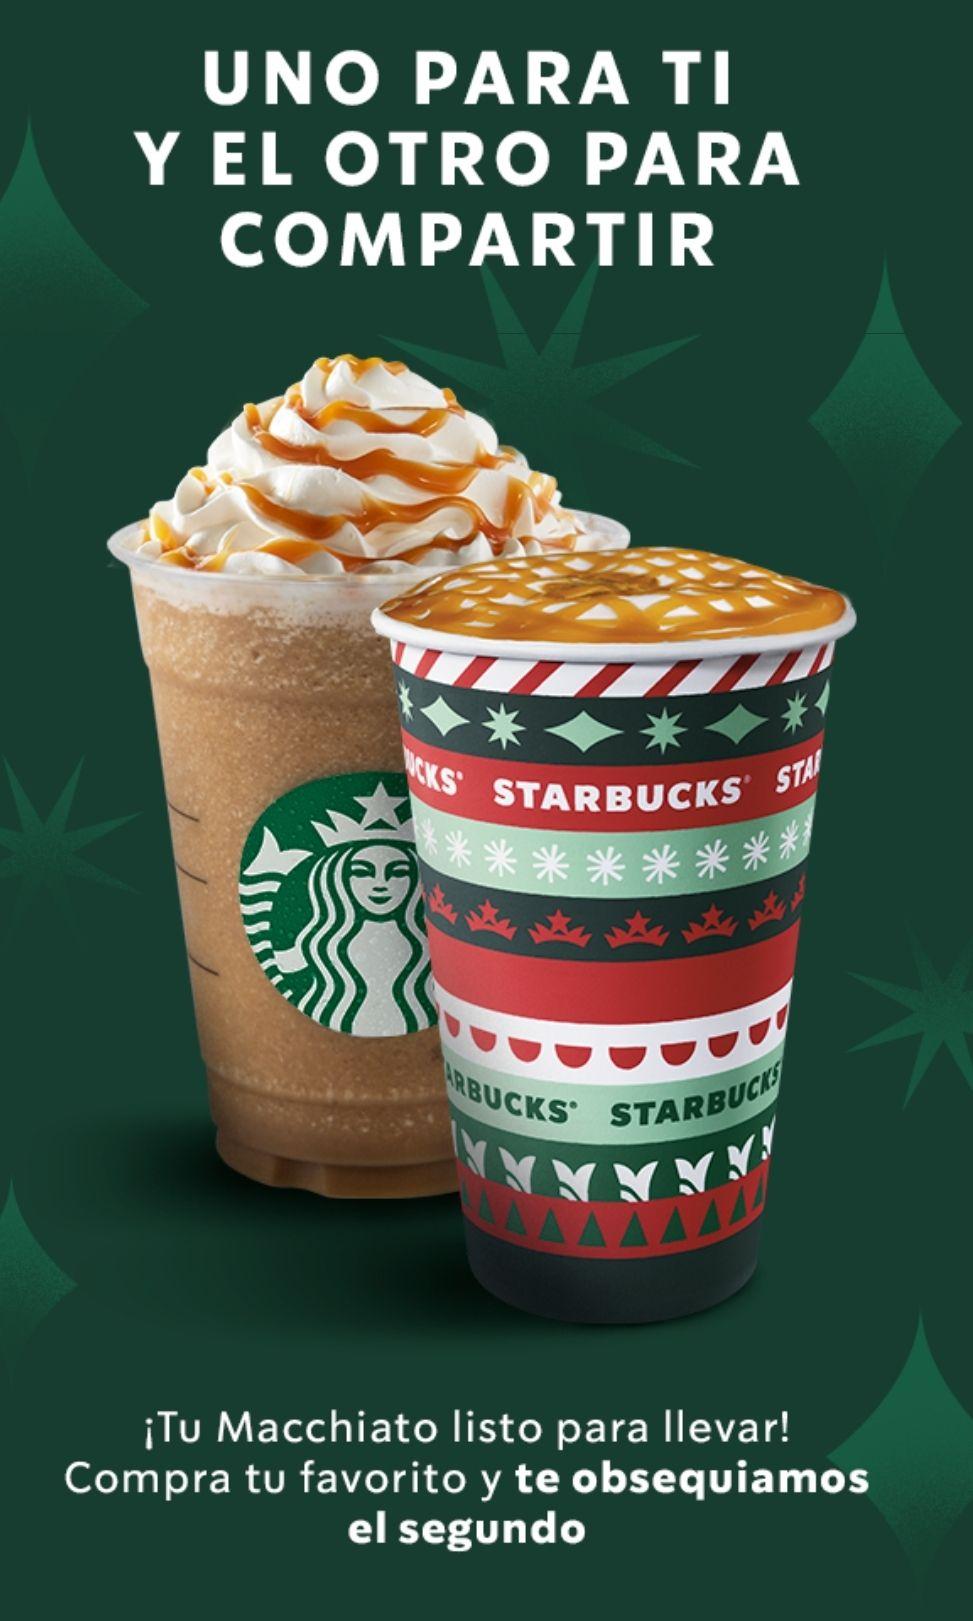 Starbucks: 2x1 en Machiatto